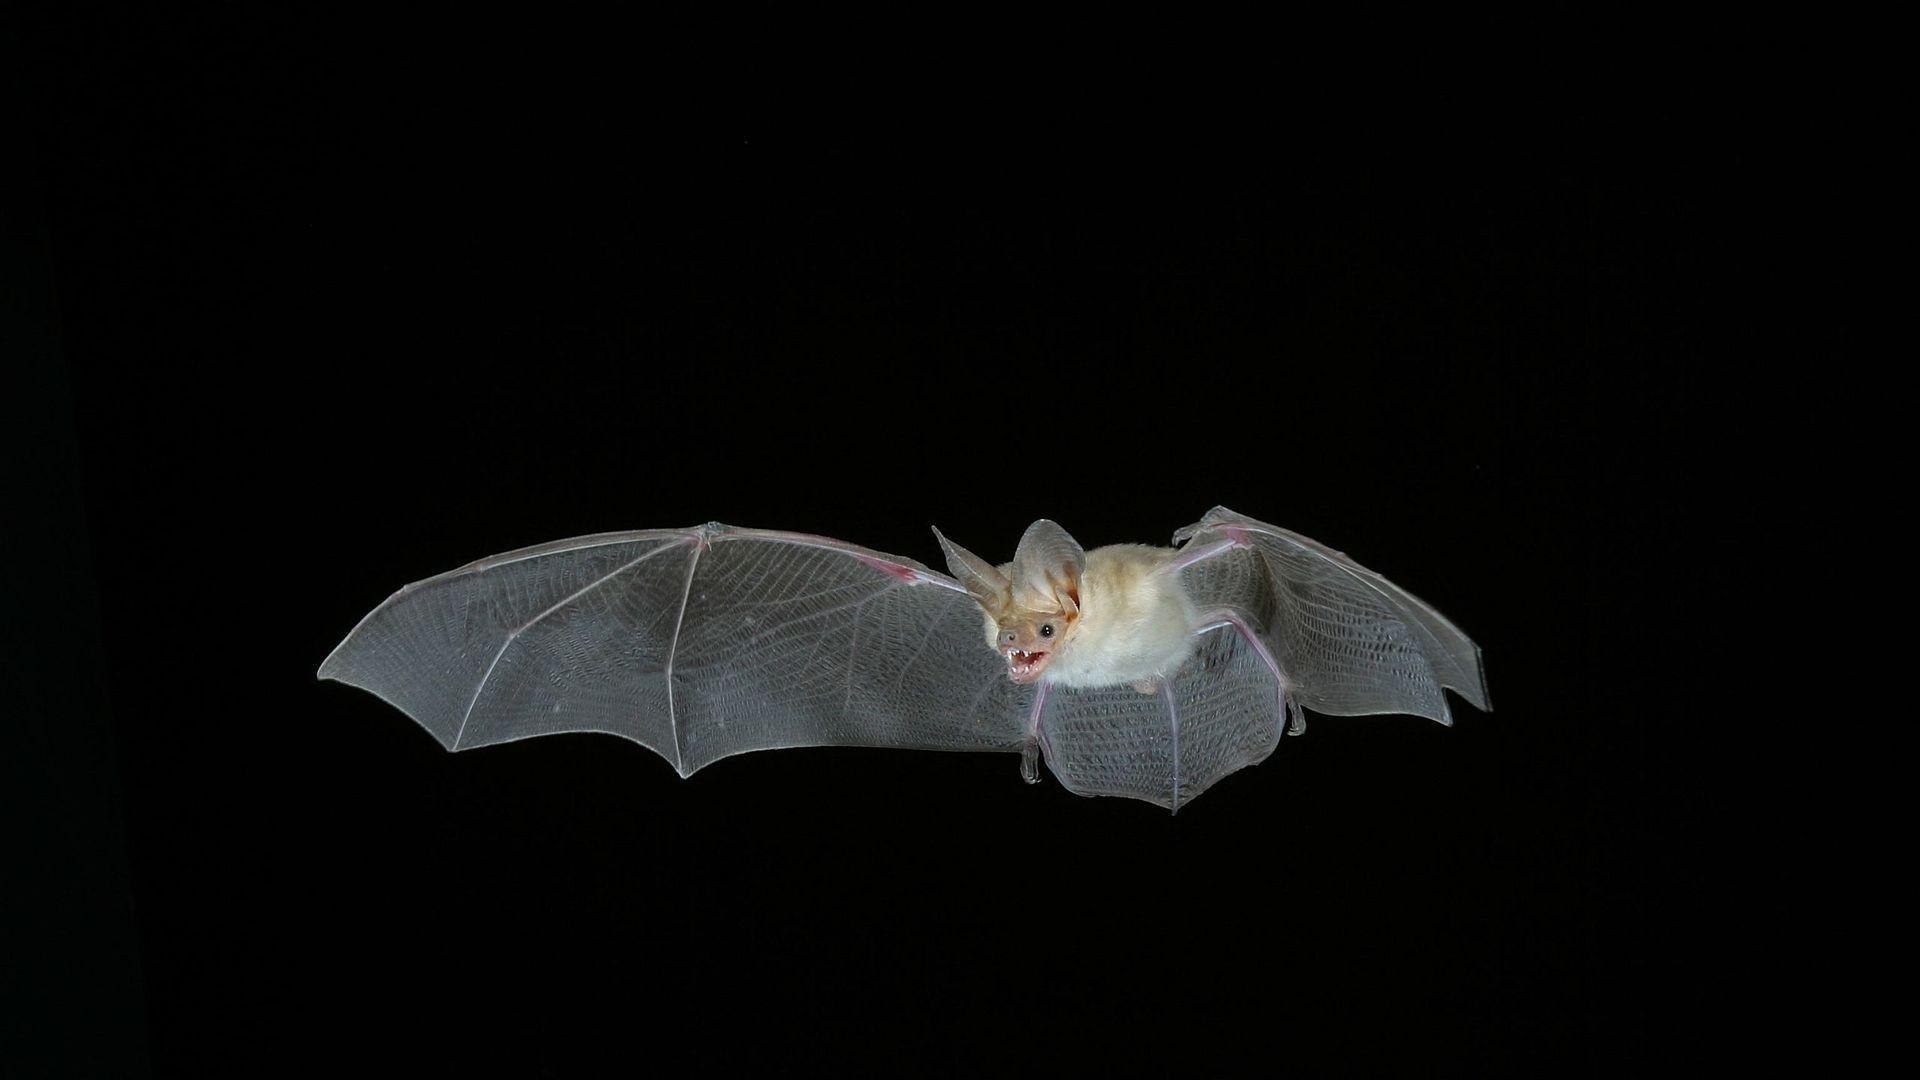 Bat PC Wallpaper HD